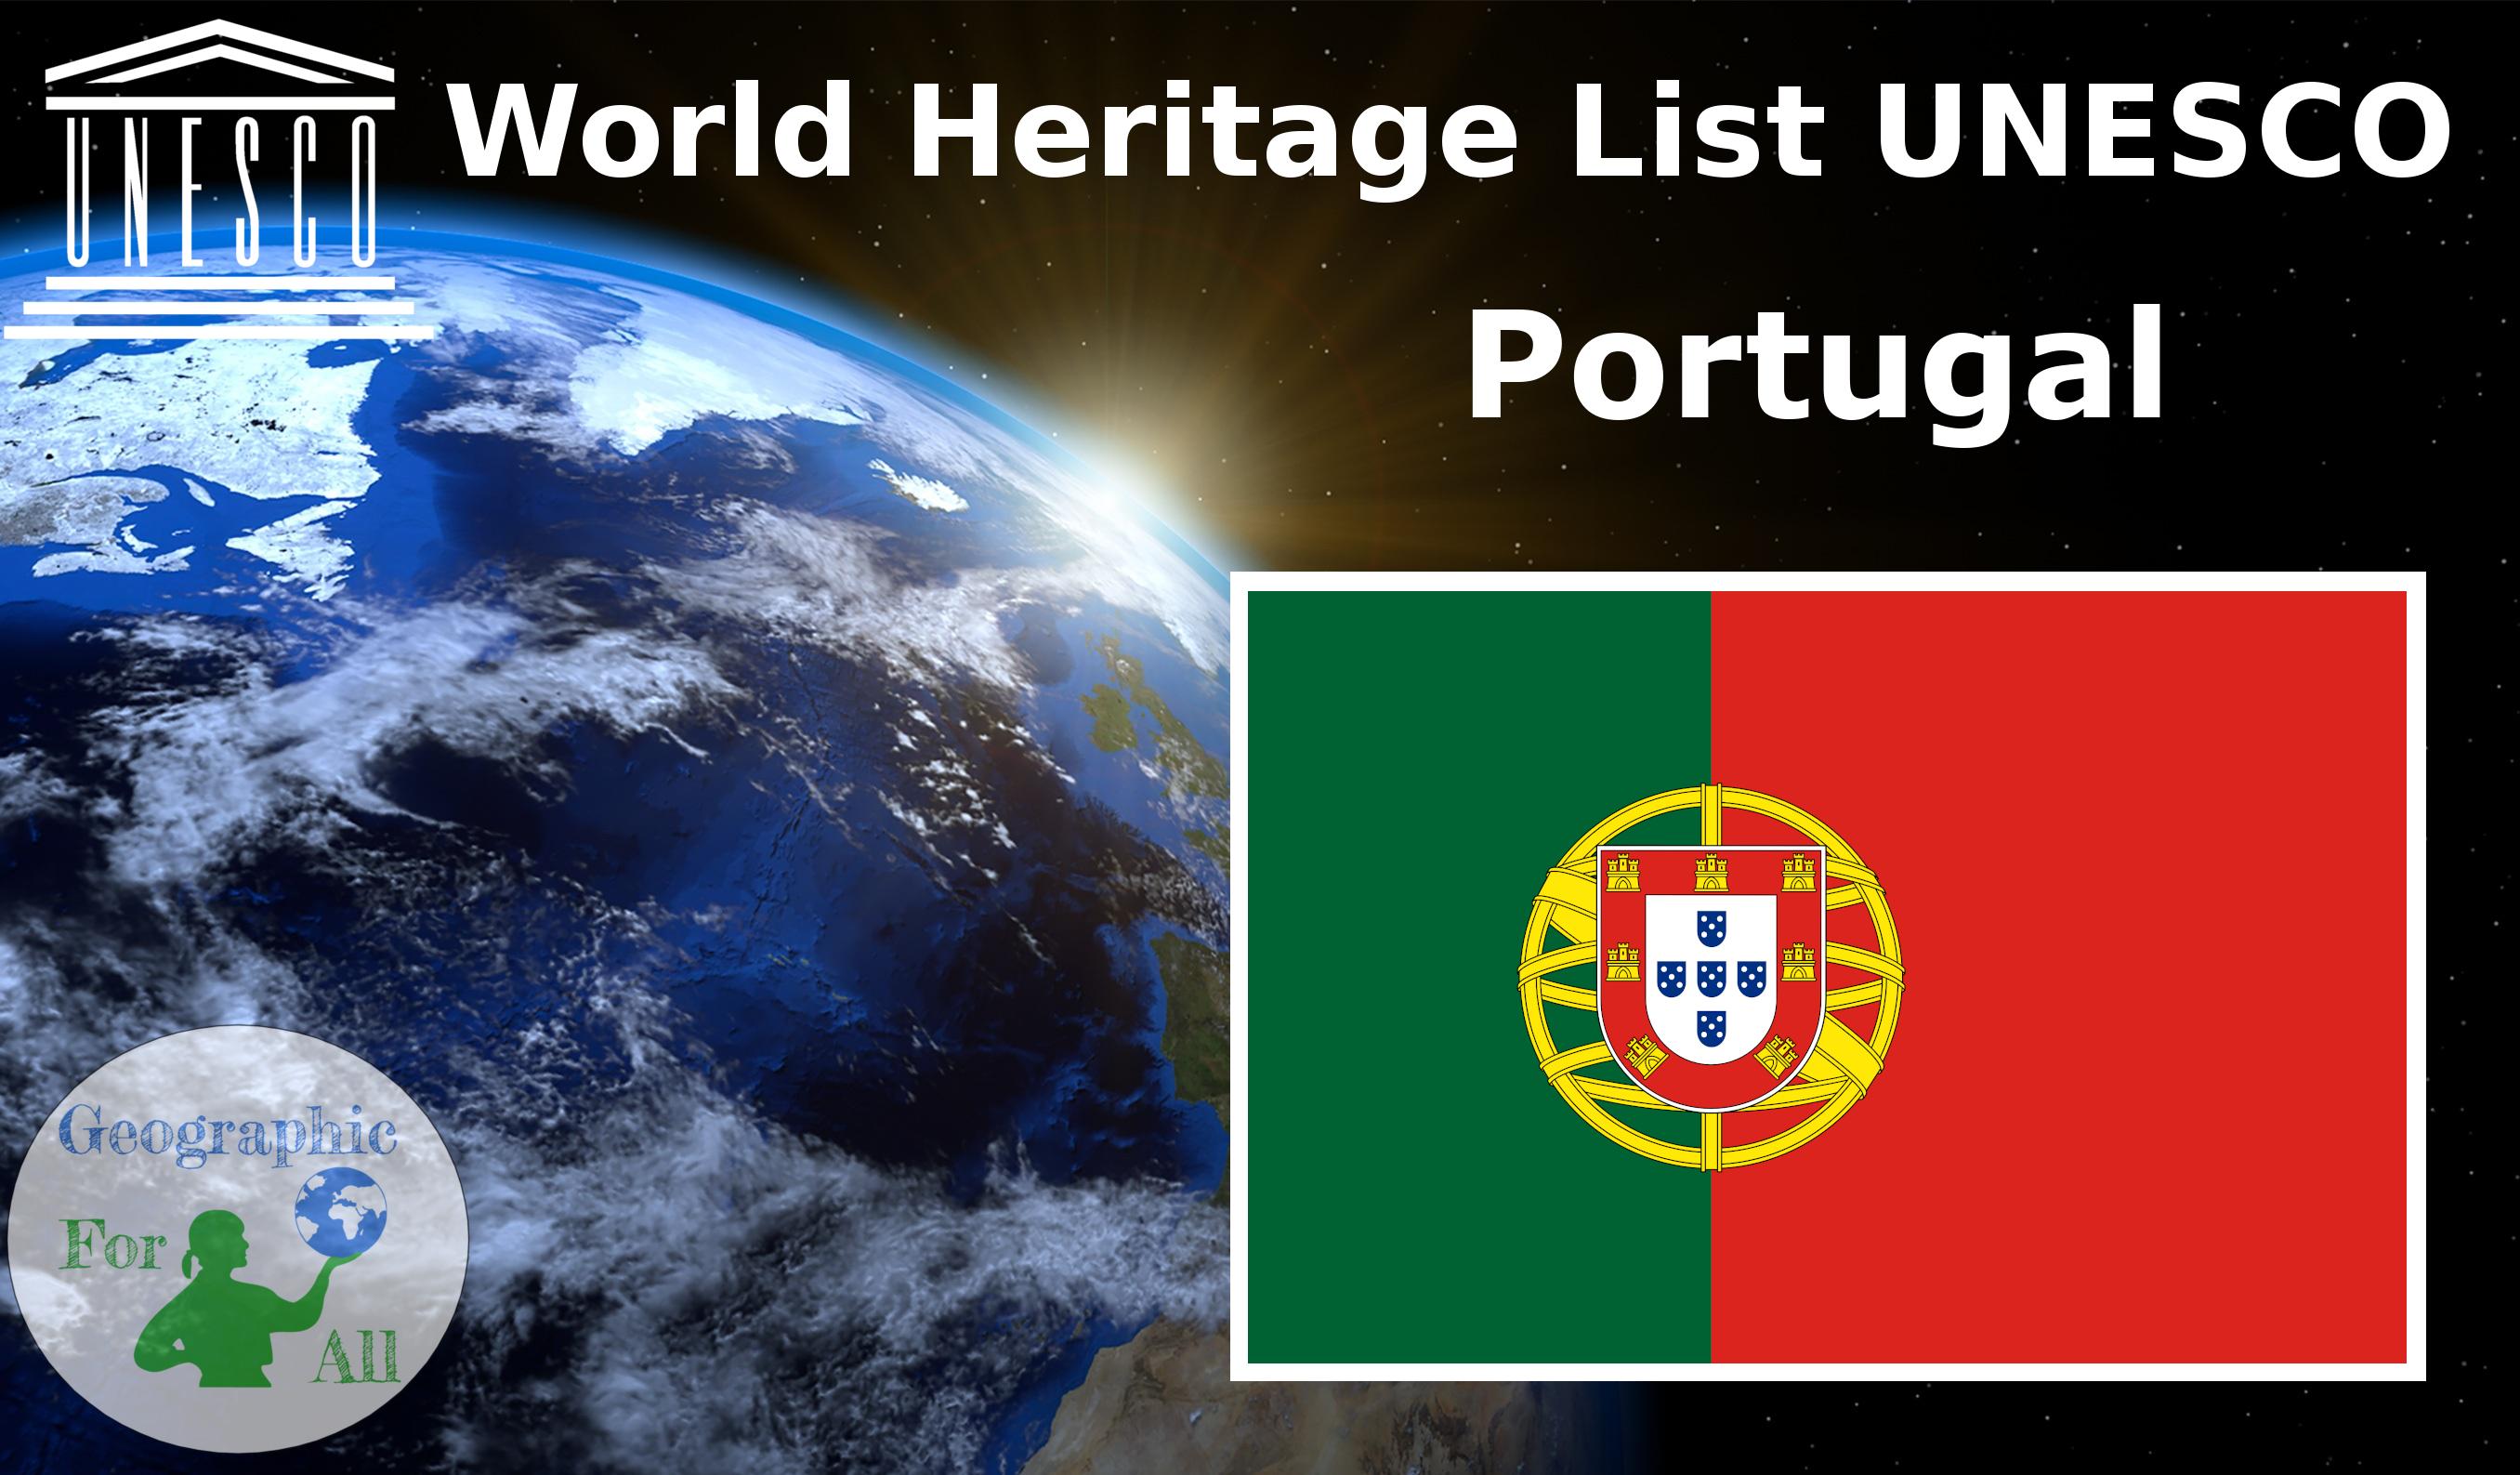 World Heritage List UNESCO - Portugal